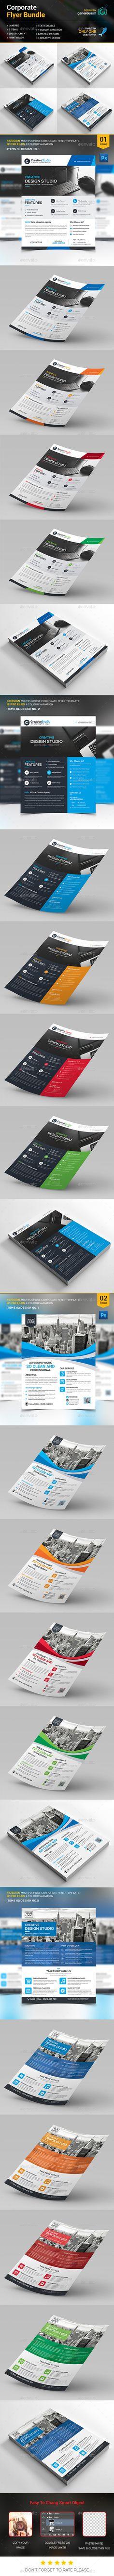 Flyer Bundle 2 in 1 - Corporate Flyers Print Design, Web Design, Business Flyer Templates, Corporate Flyer, Green Landscape, Brochures, Flyer Design, Creative Design, Banners